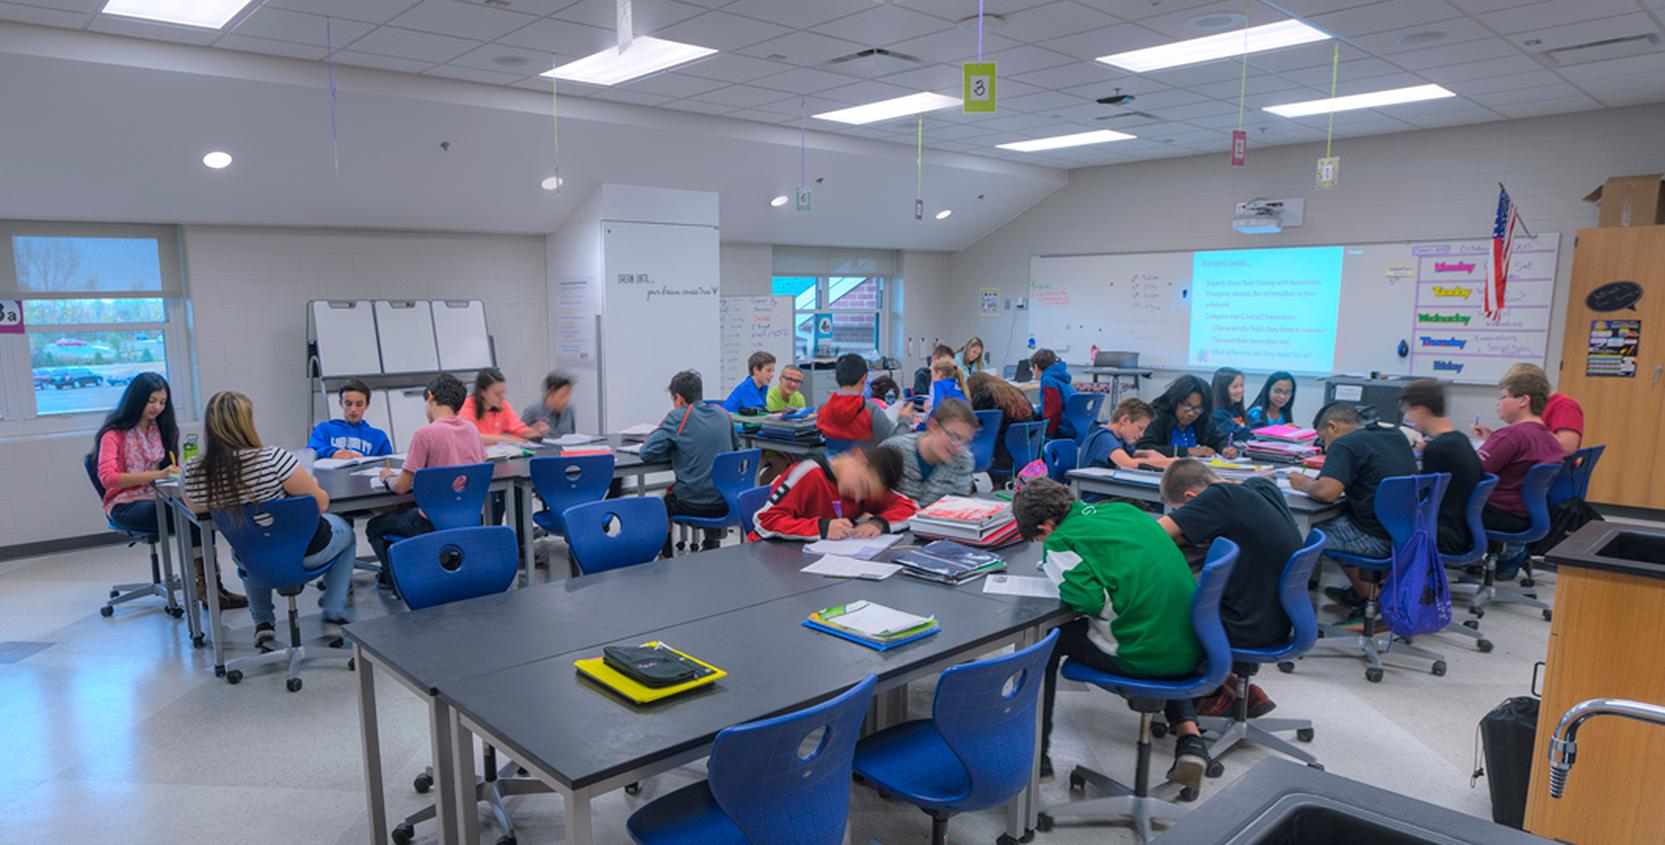 PCCS-Liberty-Middle-School-Classroom_1665x845